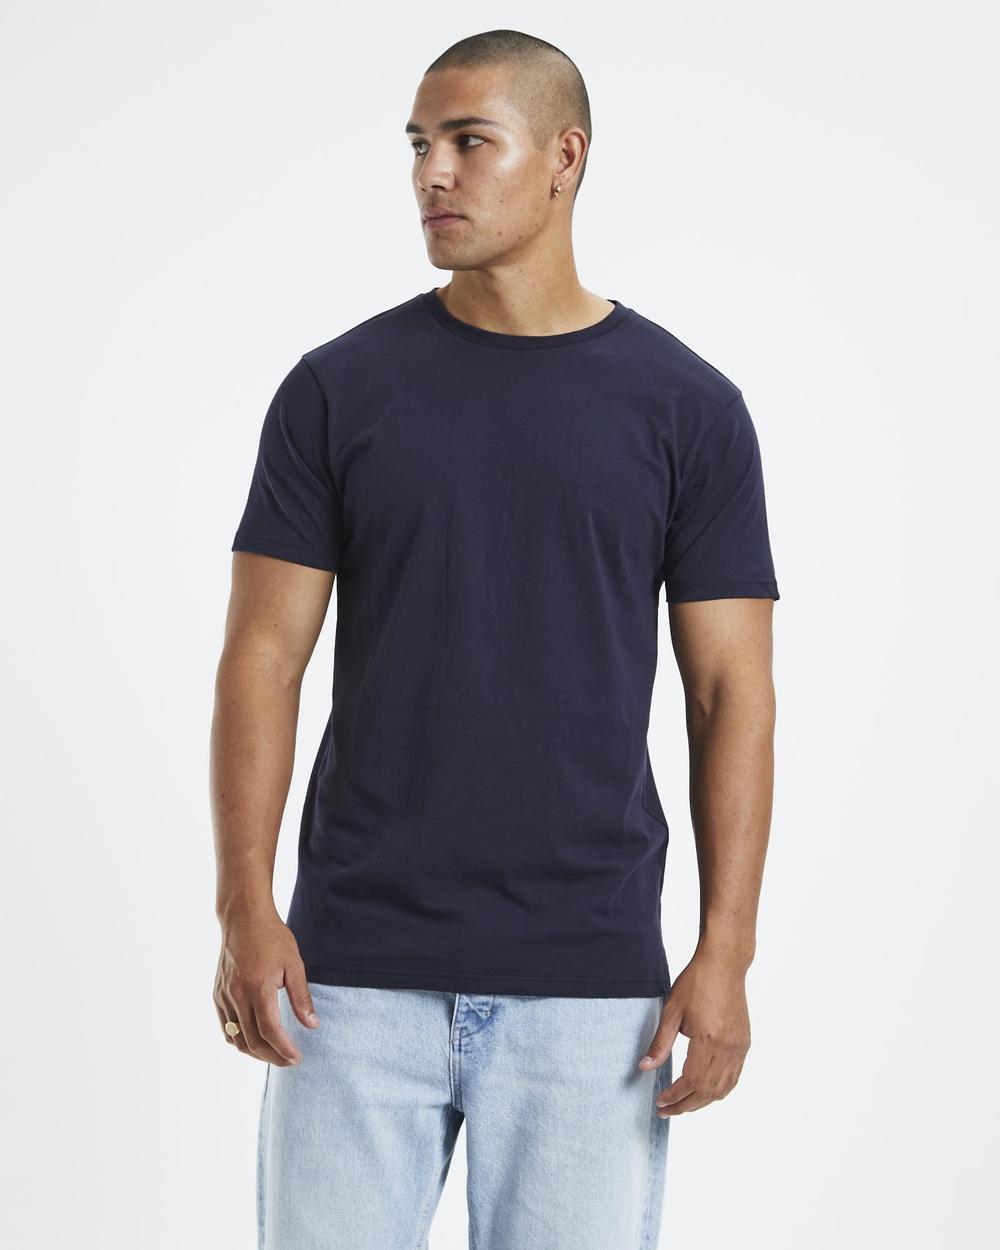 General Pants Co. Basics Basic Crew T Shirt Short Sleeve T-Shirts NAVY T-Shirt